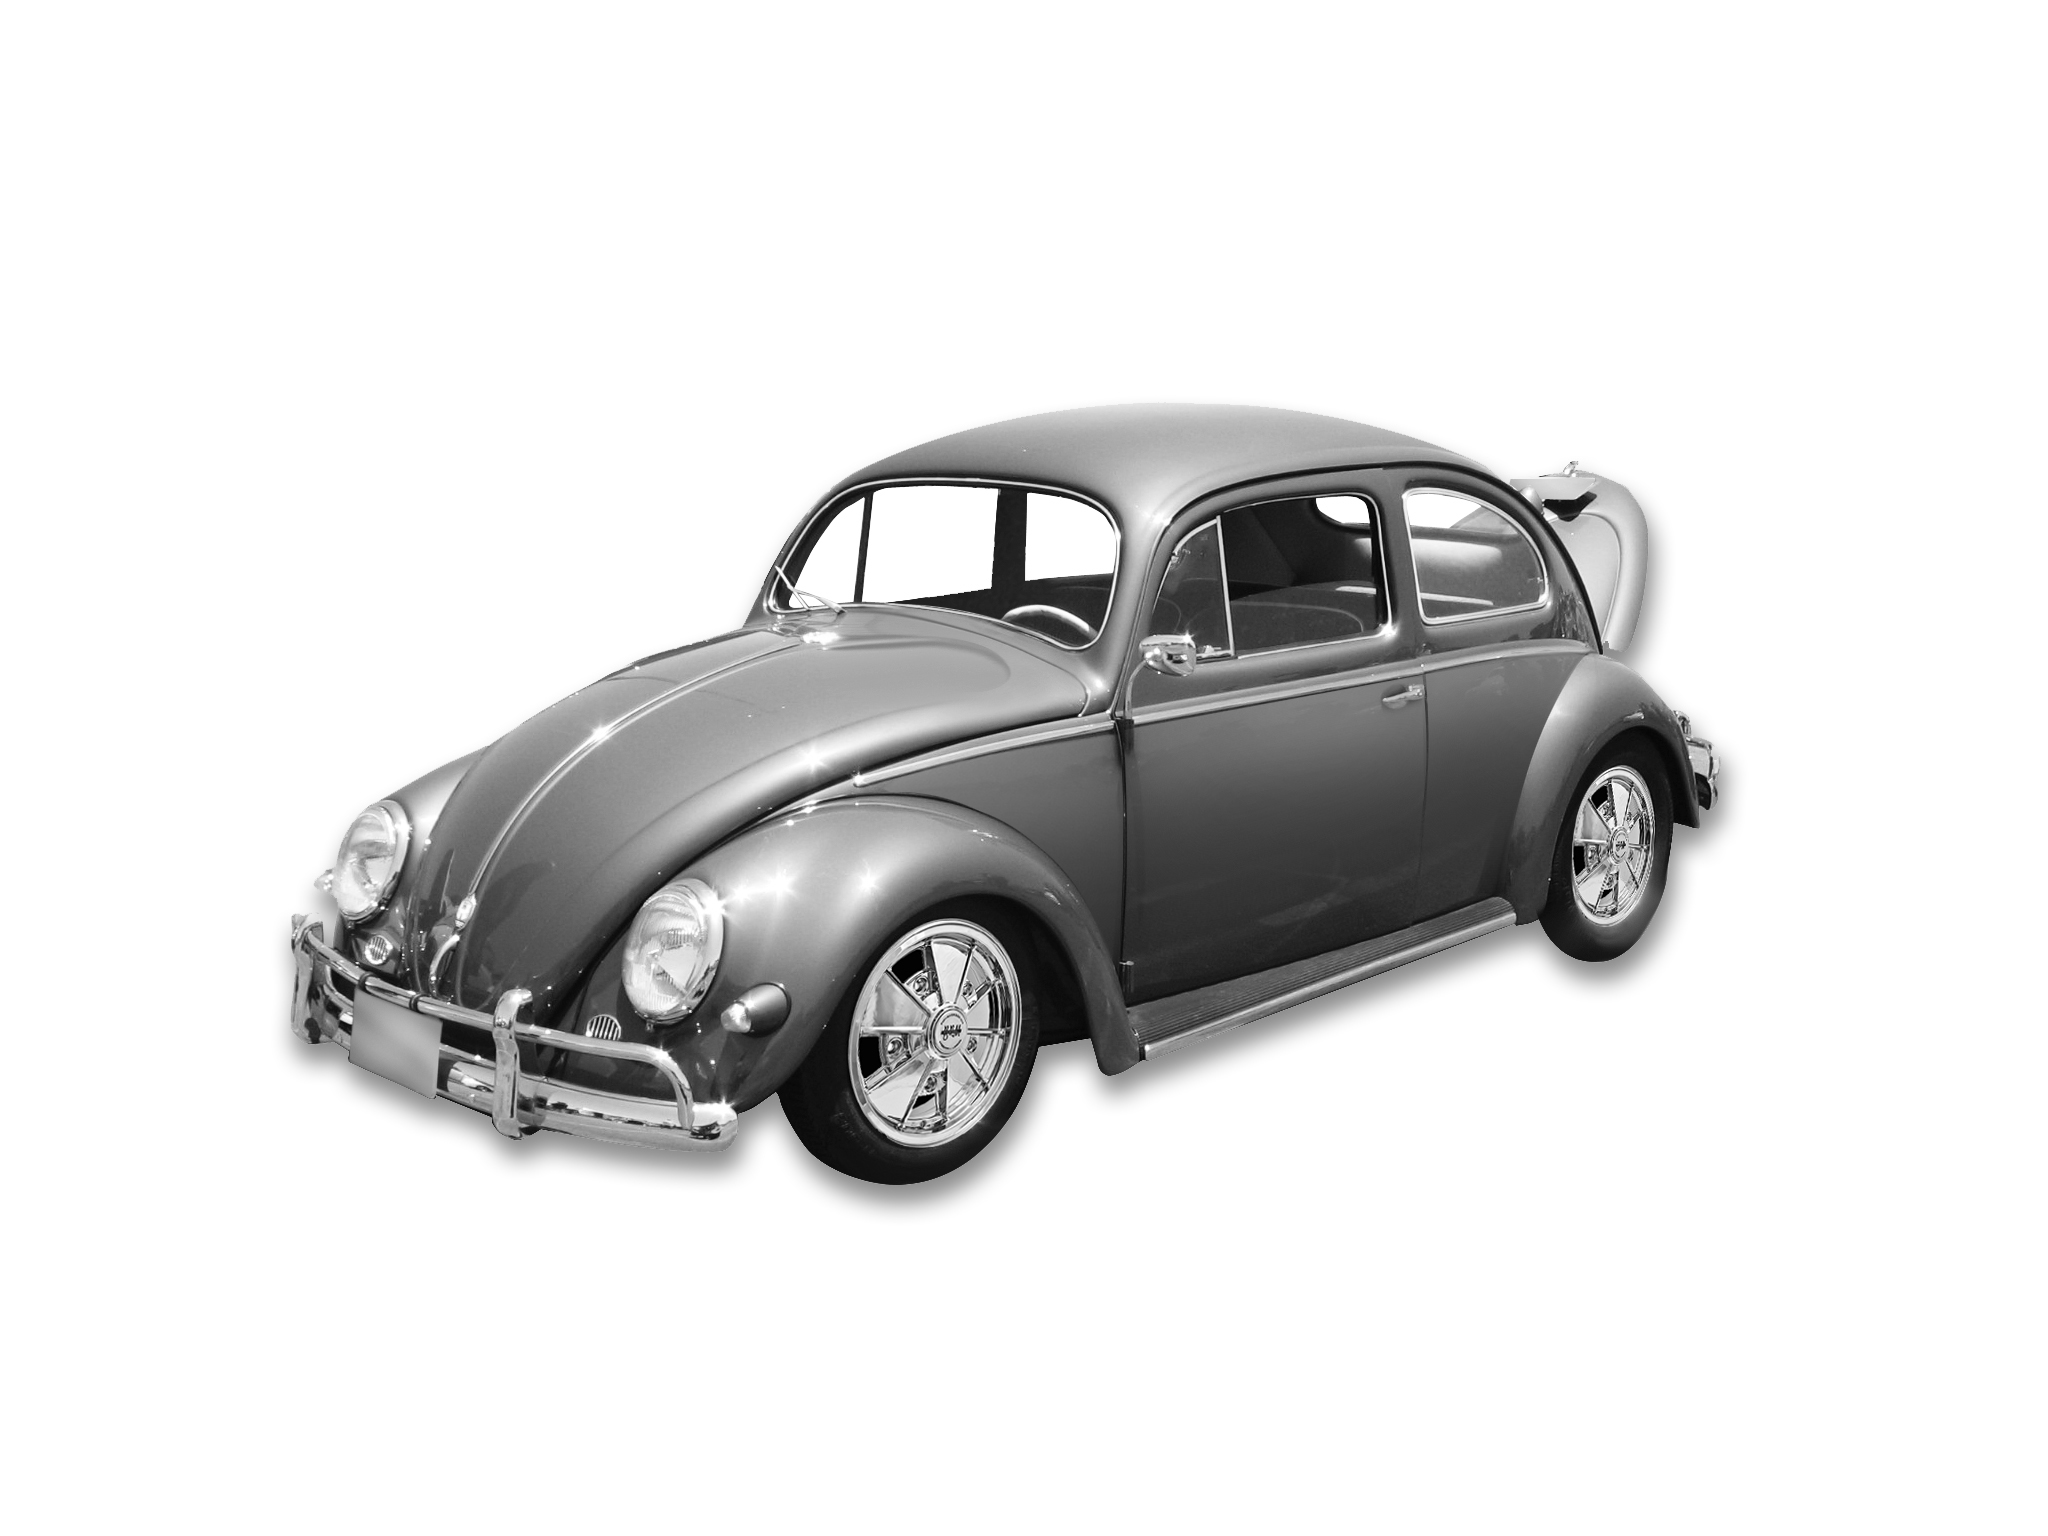 Vw Pop Out Window Kits Jbugs 69 71 Volkswagen Beetle Wiring Diagram Bug Windows